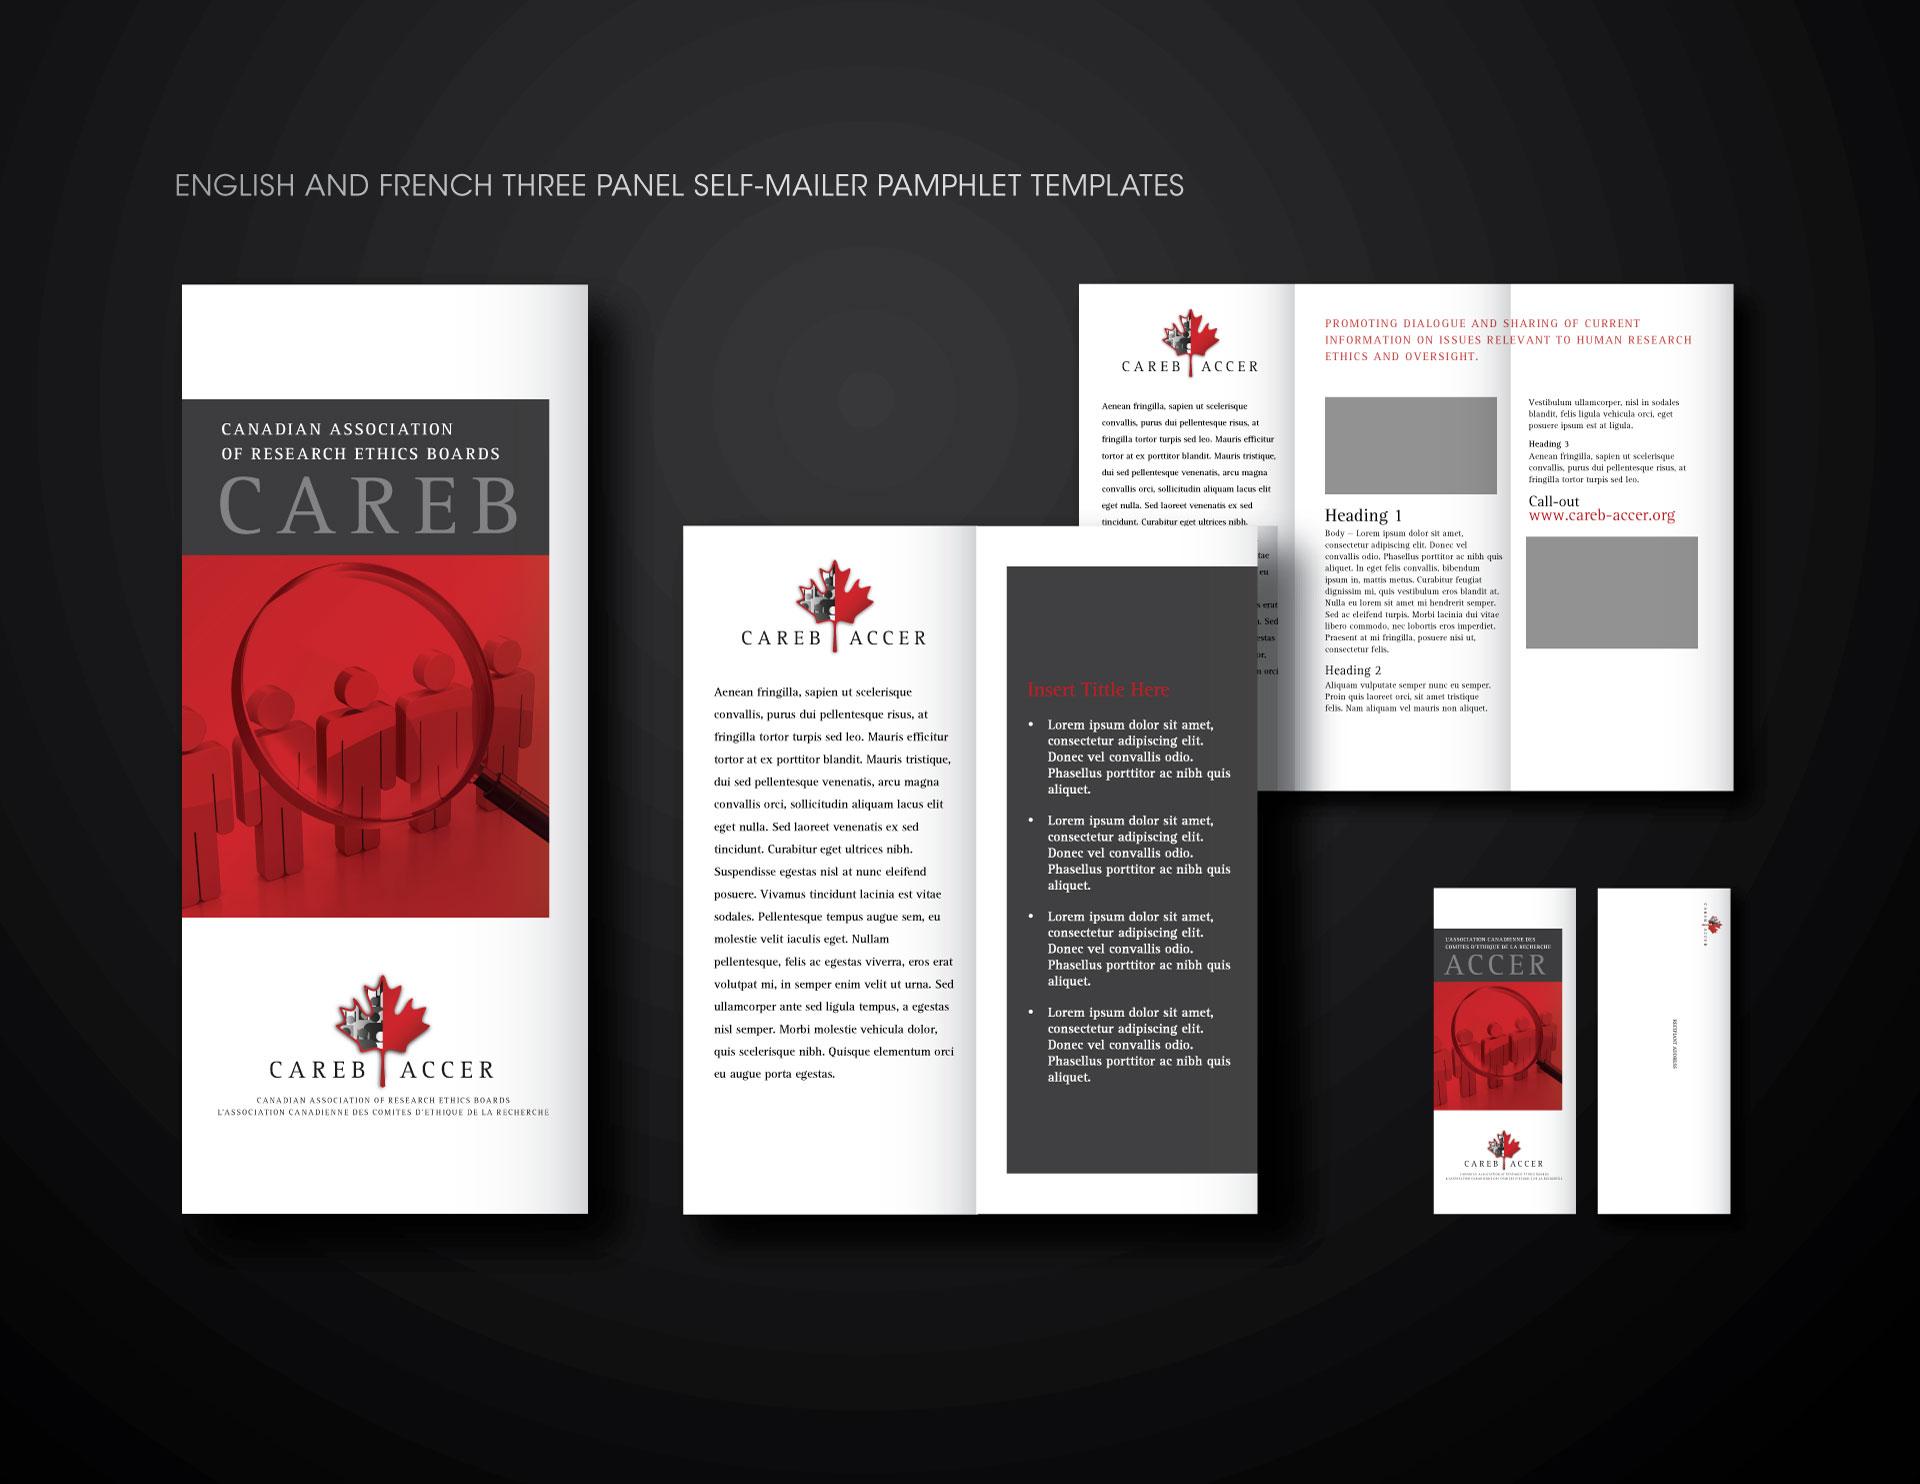 folio_CAREB-Pamphlet